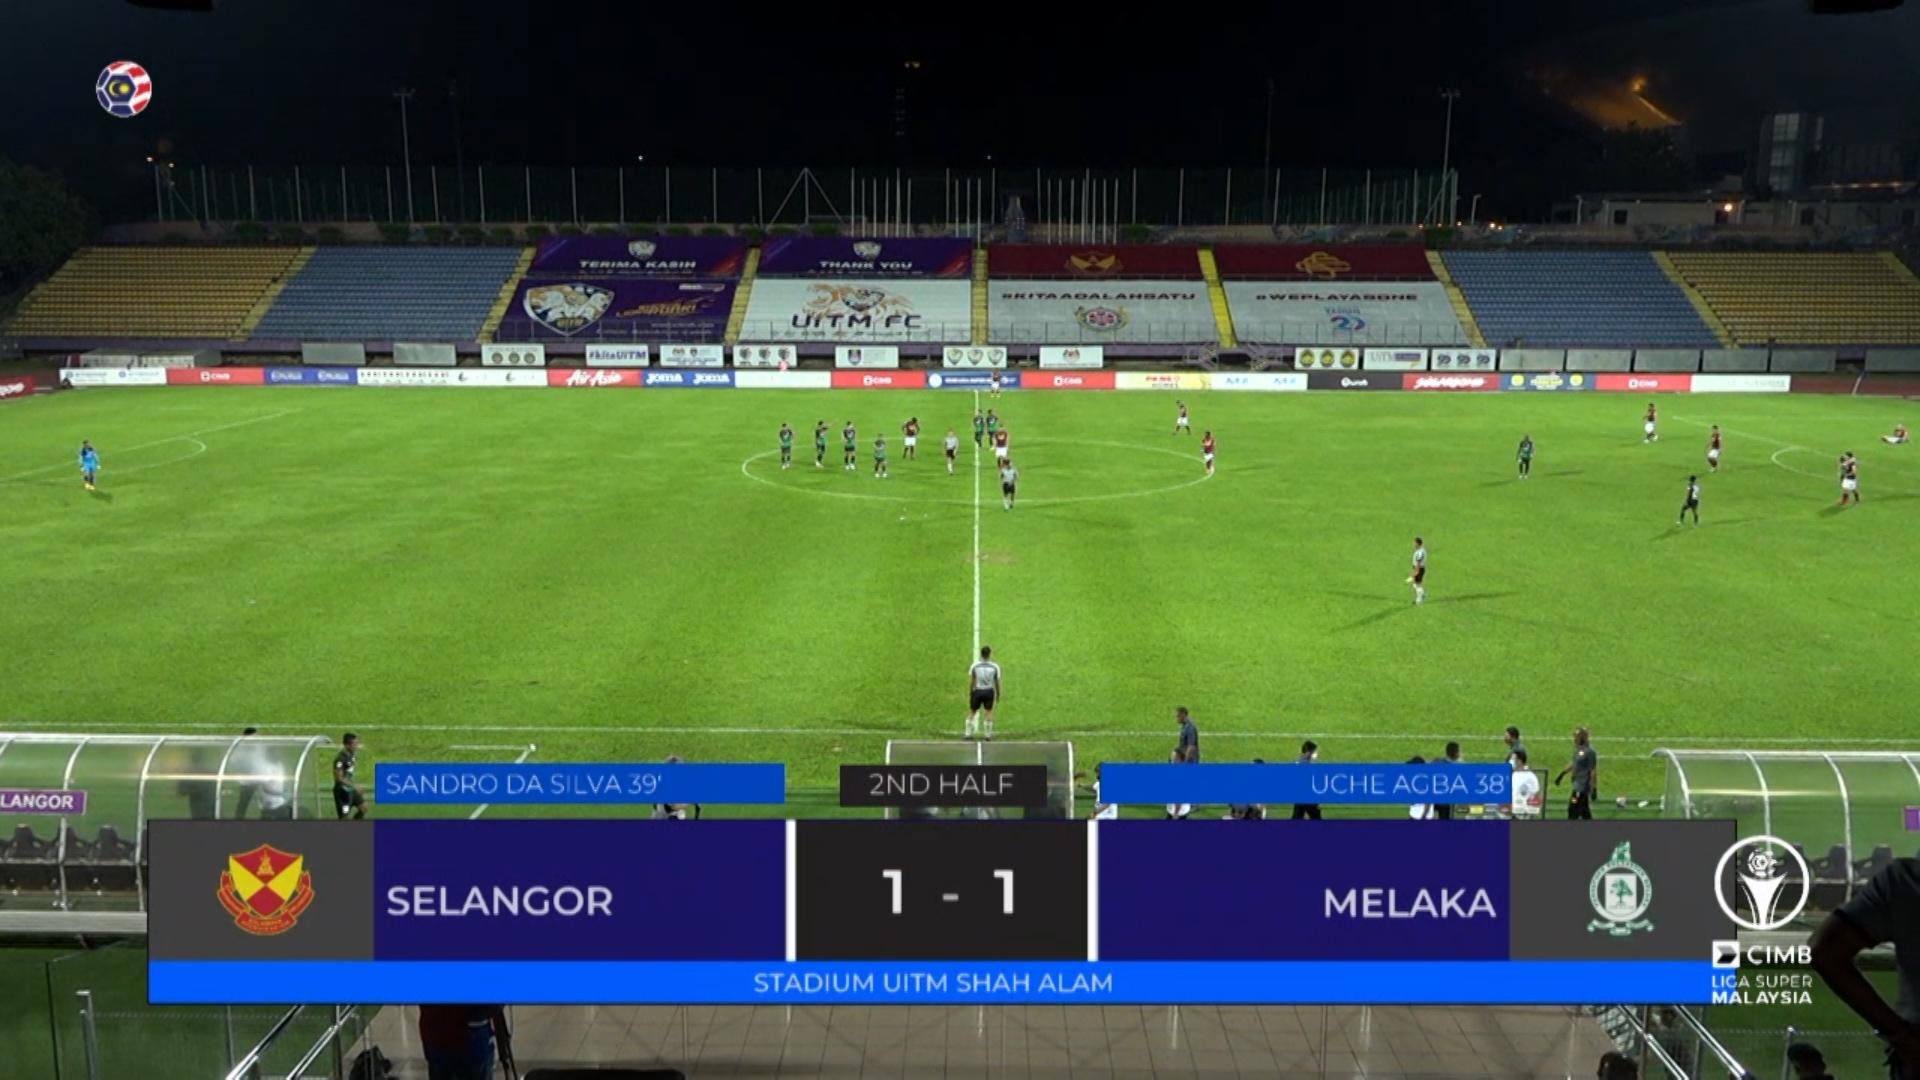 msl 2020 Selangor